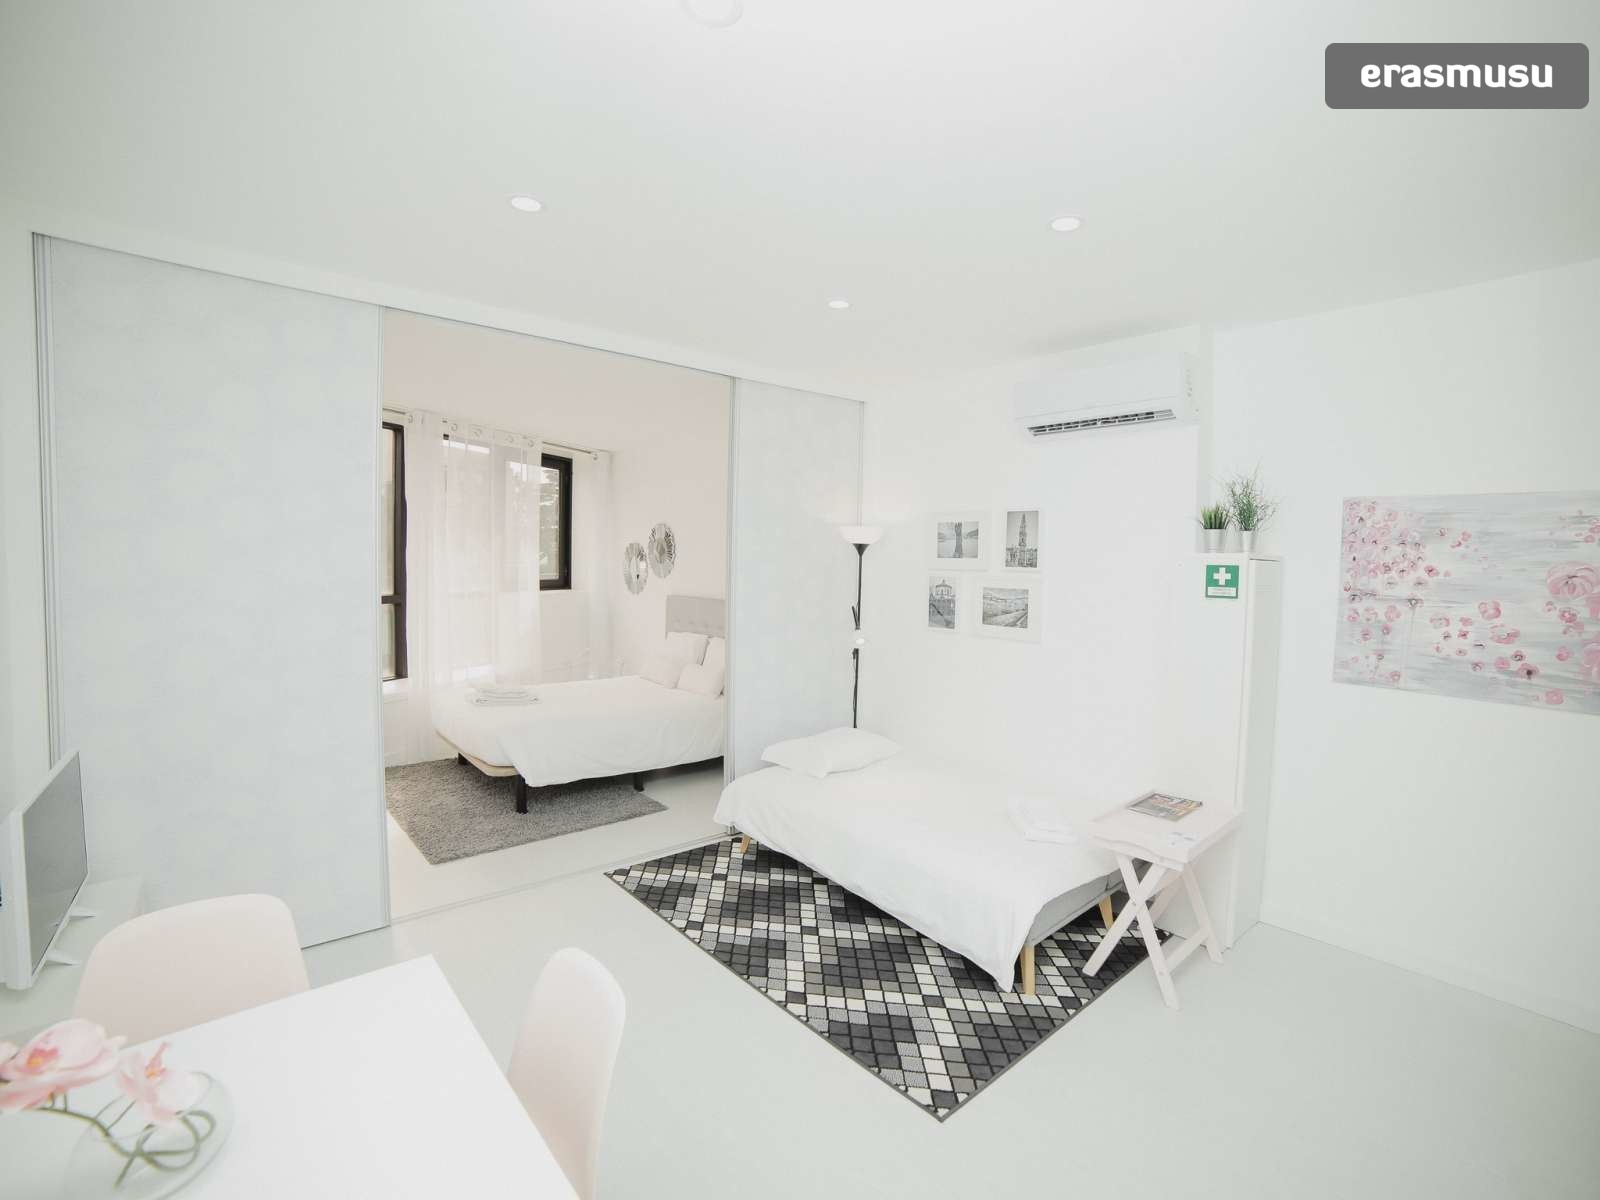 bright-studio-rent-santo-ildefonso-porto-0b8edbdce05711510989c8e